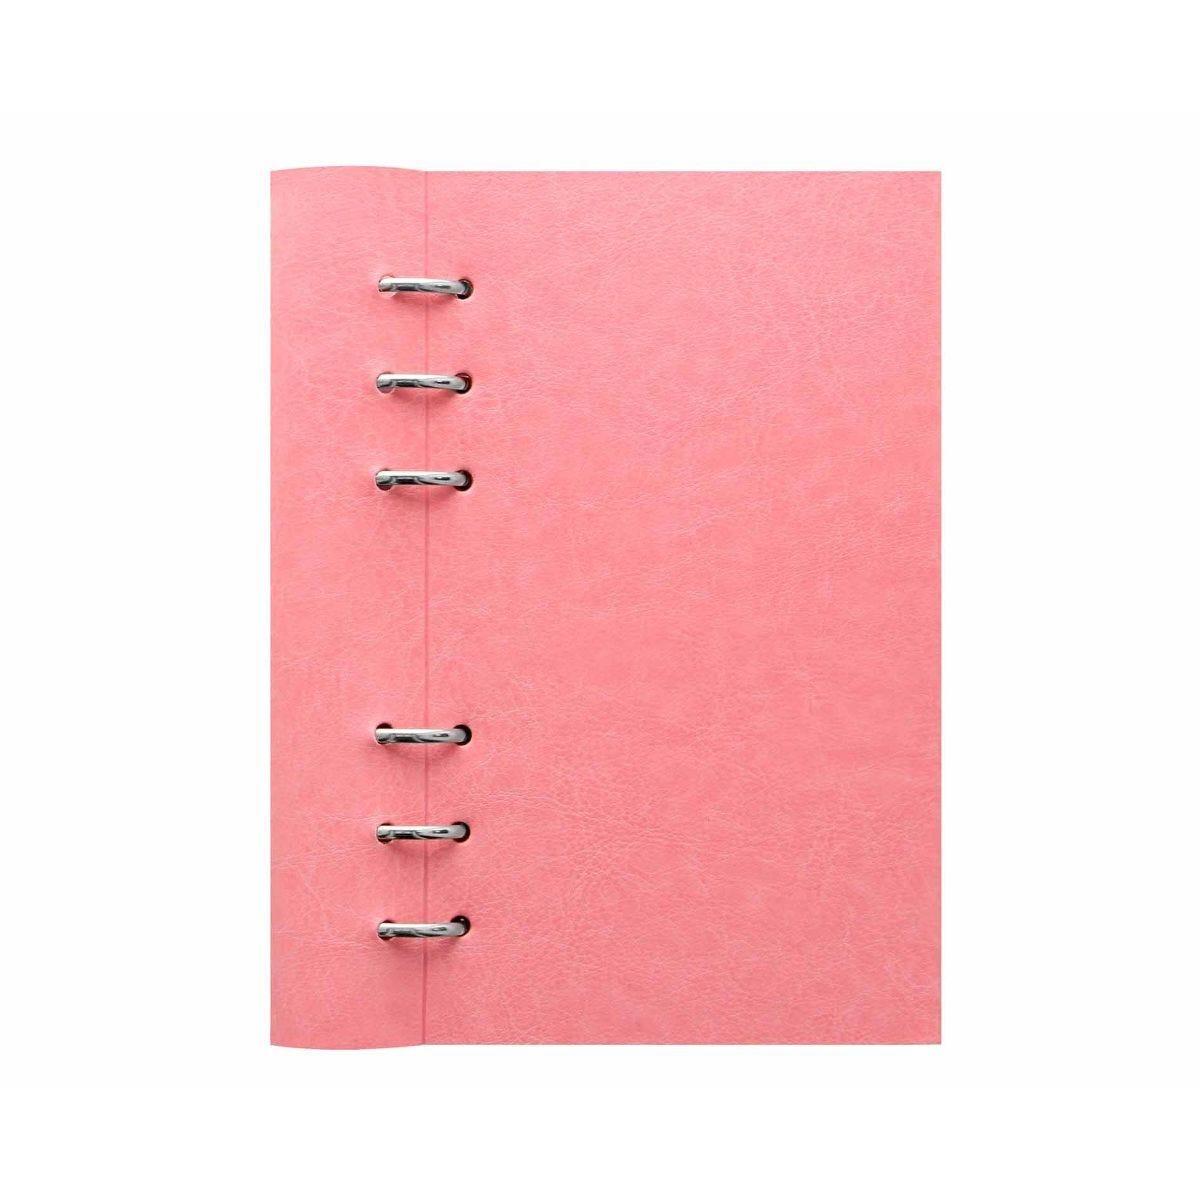 Filofax Refillable Clipbook Planner Personal Rose